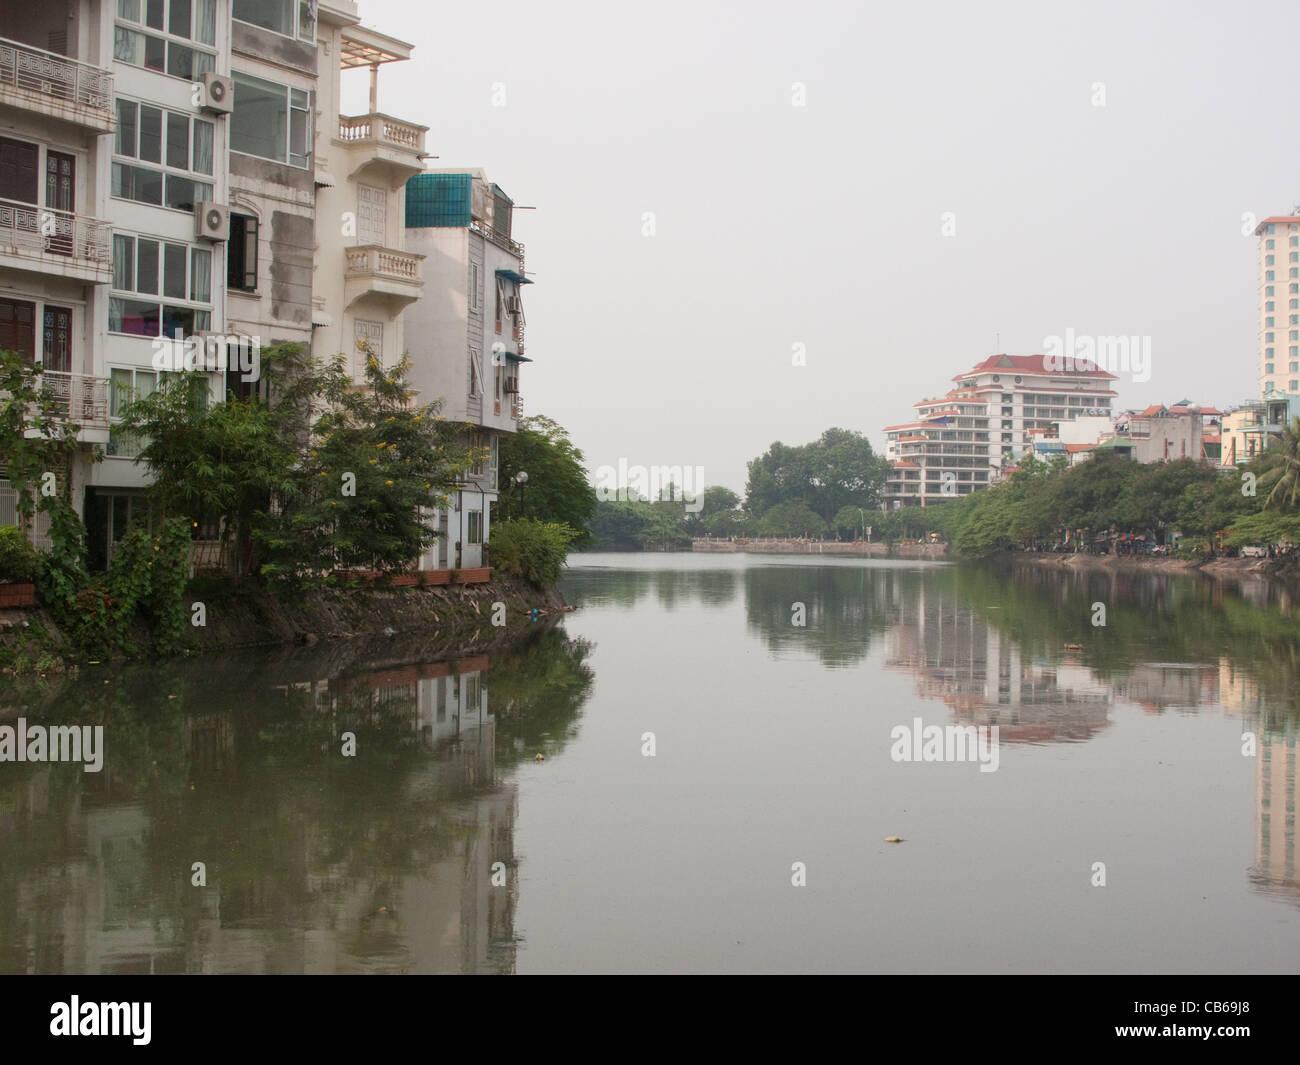 View of houses around Truc Bach Lake in Hanoi, Vietnam - Stock Image